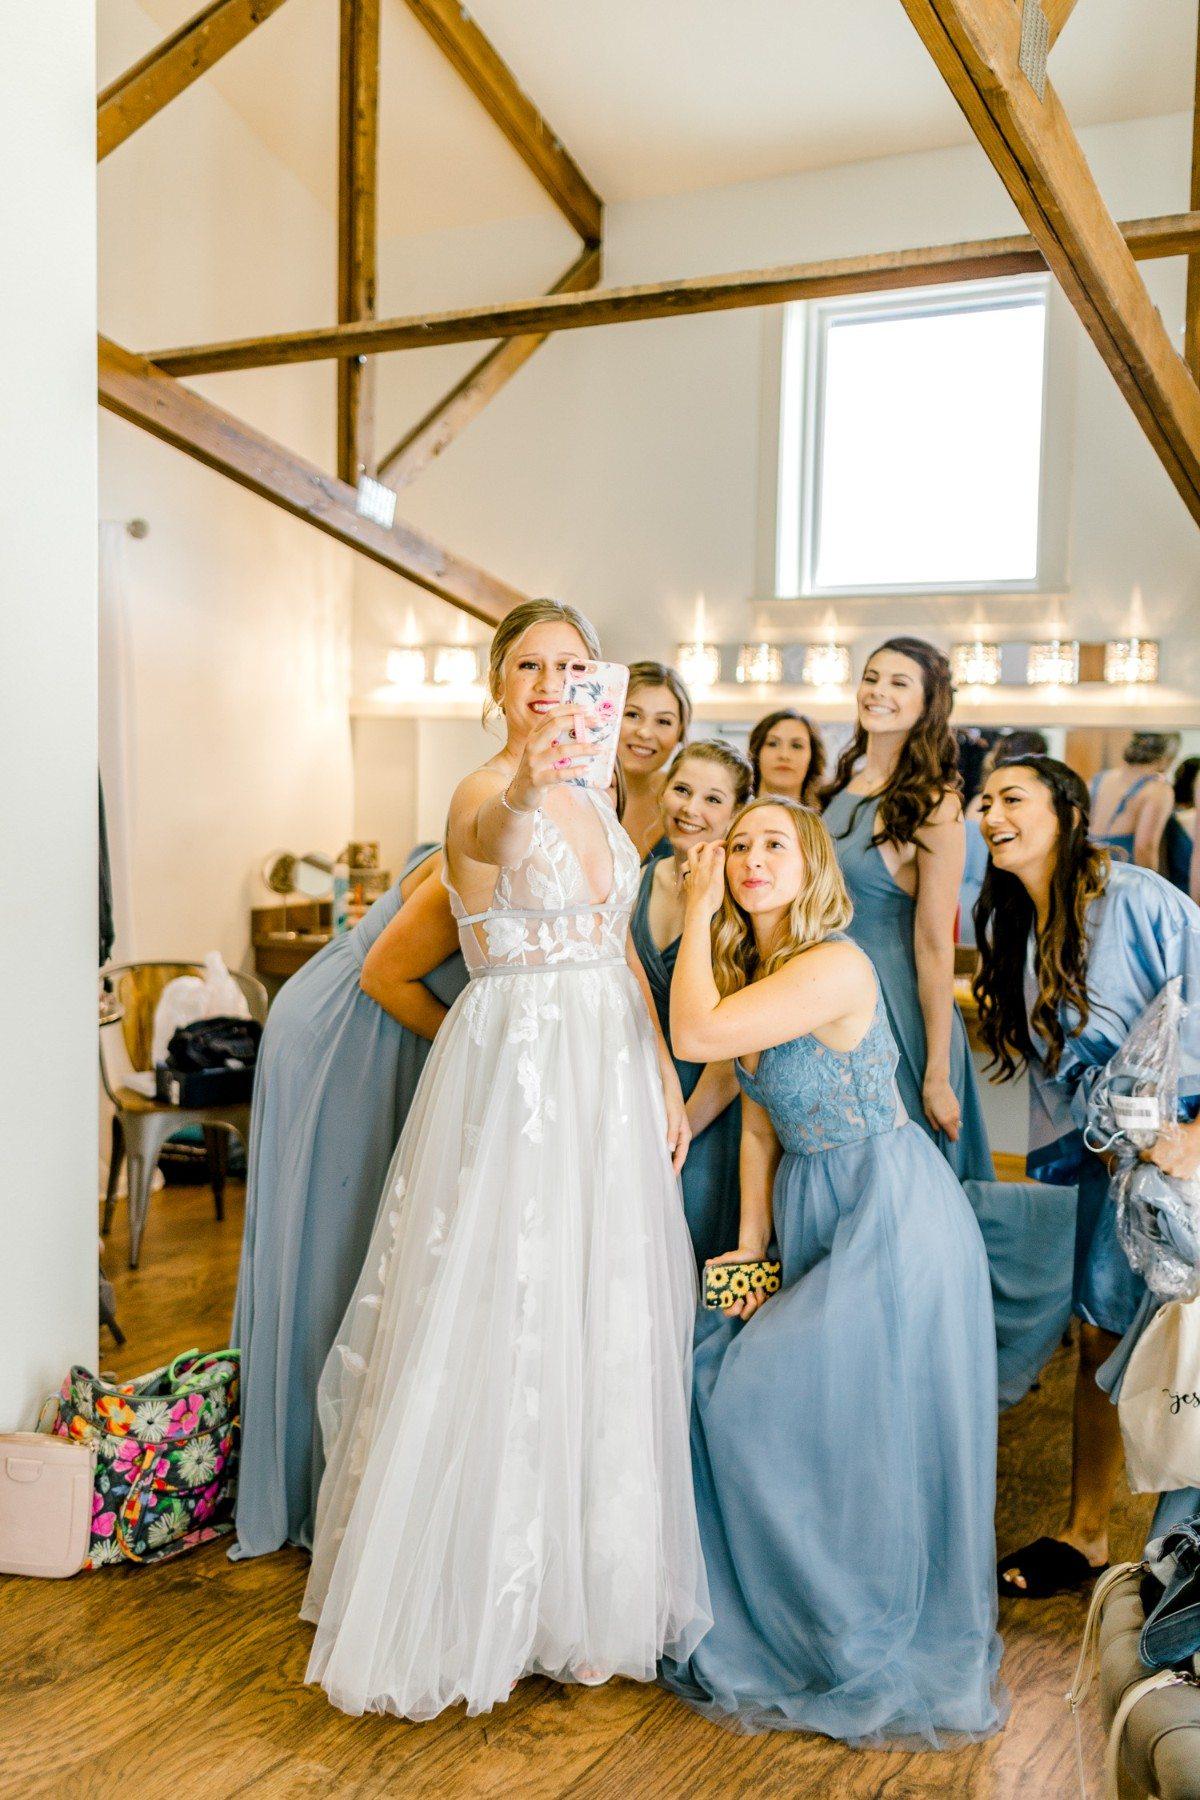 ennis-texas-wedding-photographer-kaitlyn-bullard-19.jpg